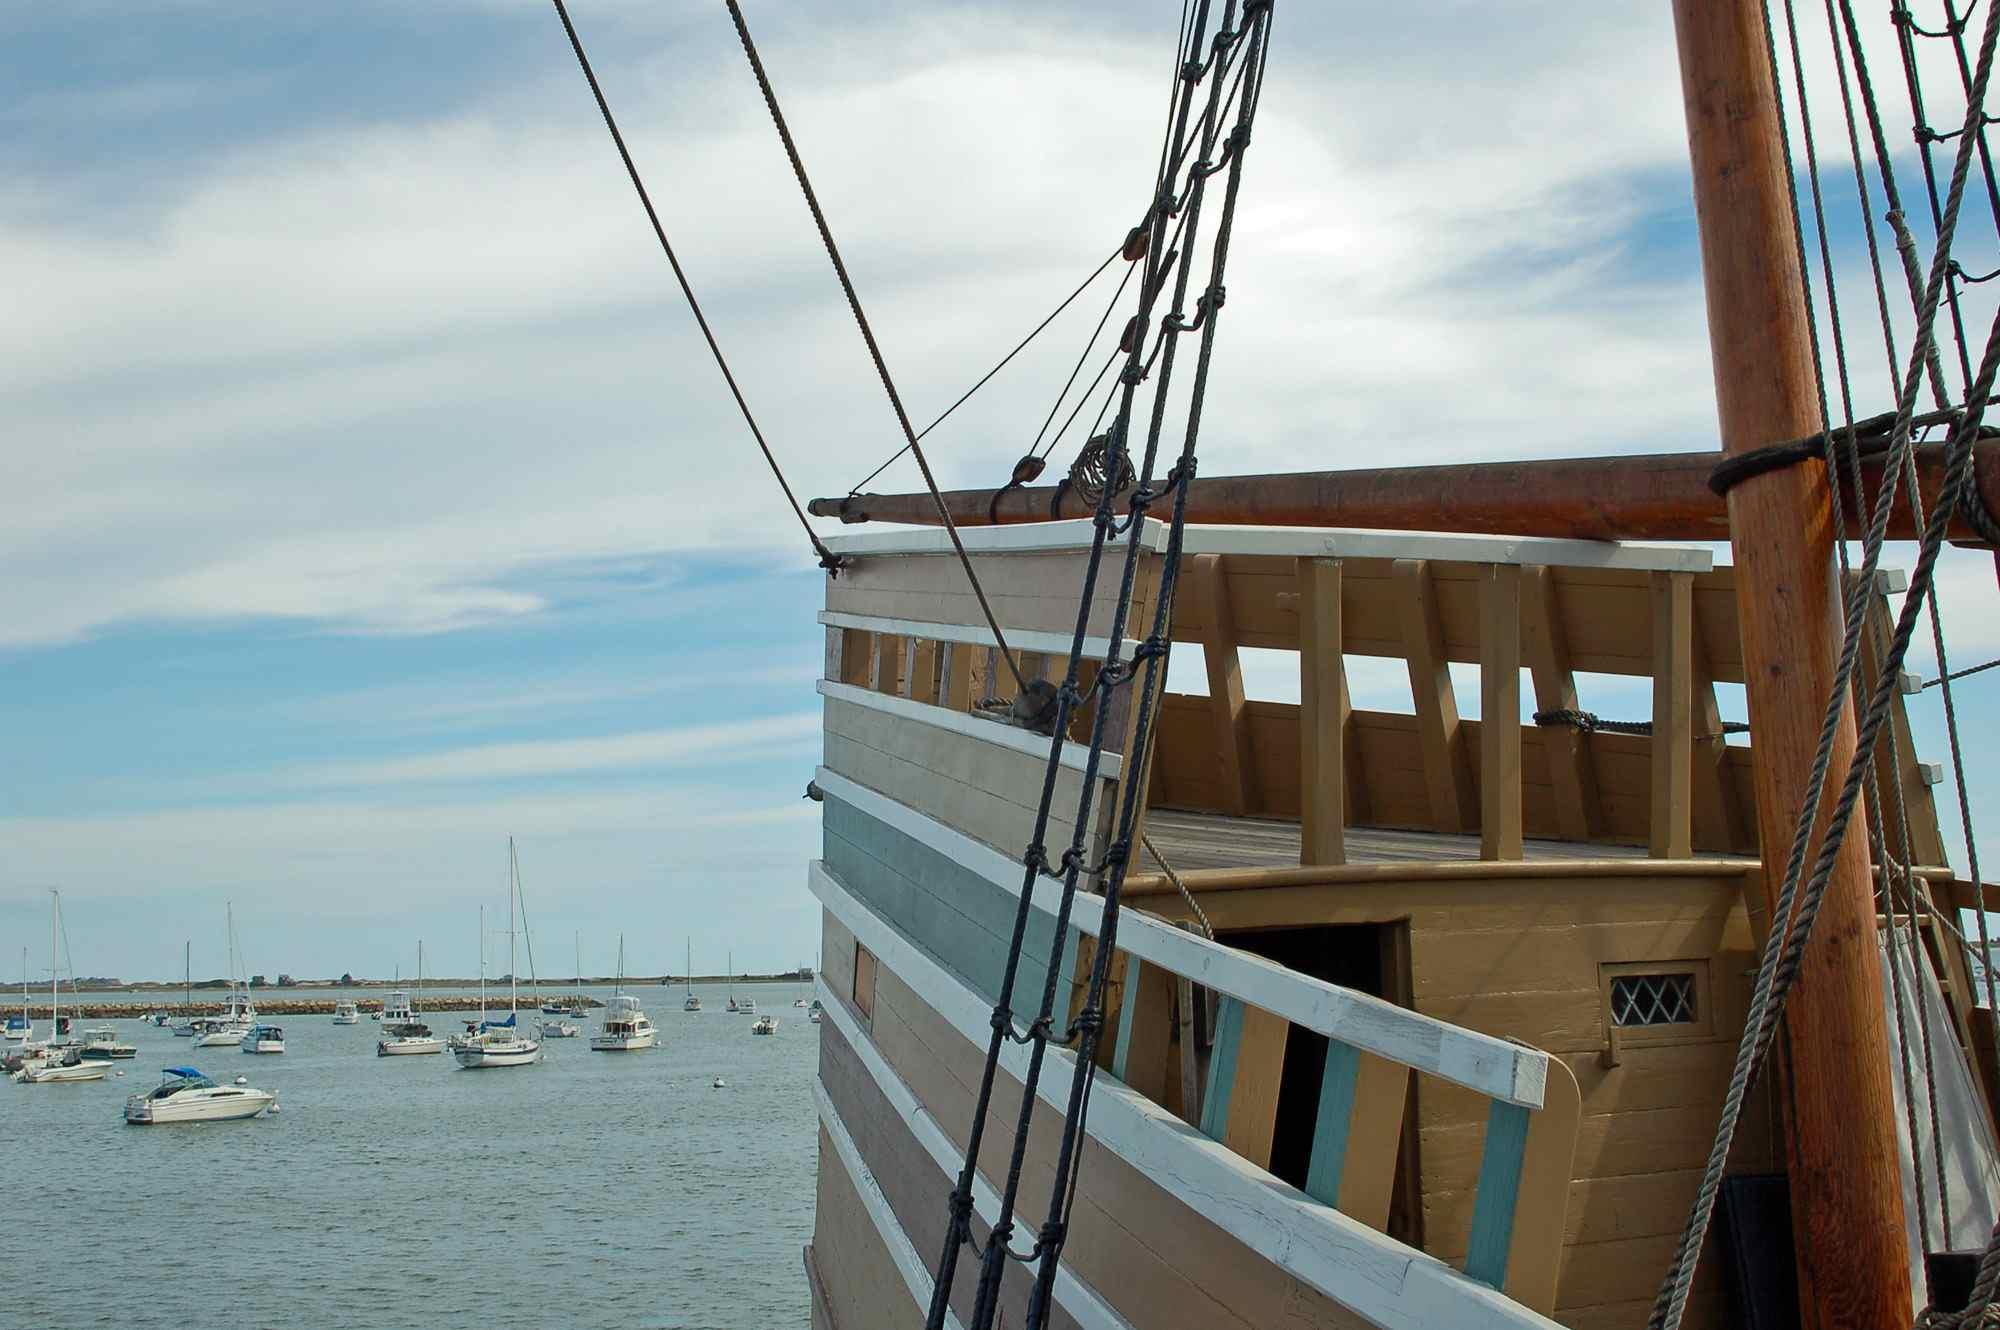 Mayflower II Attraction in Plymouth Massachusetts